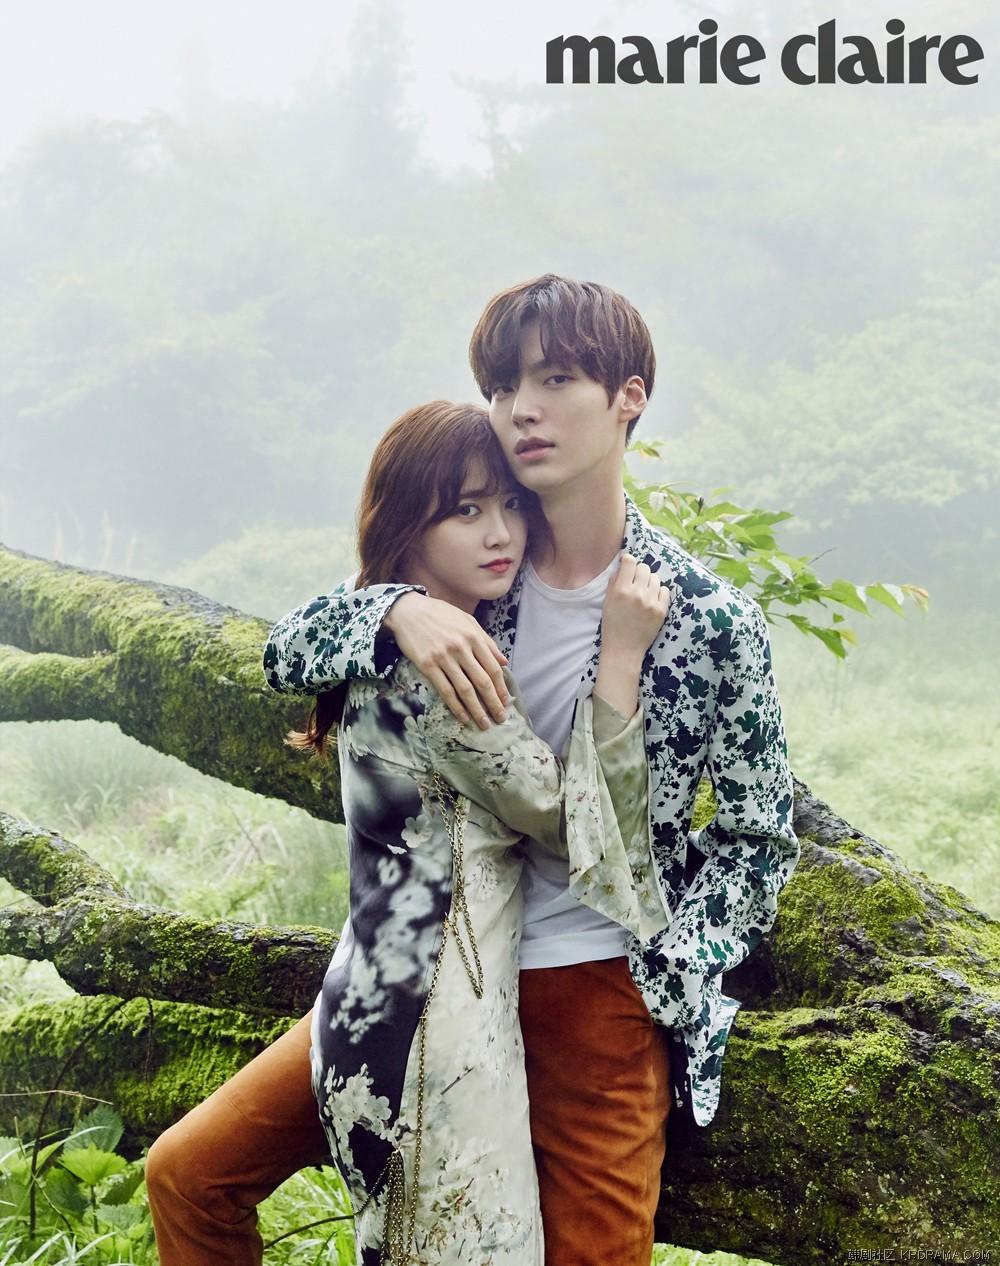 K-Star]: With just an unrelated idea, Goo Hye Sun clarified